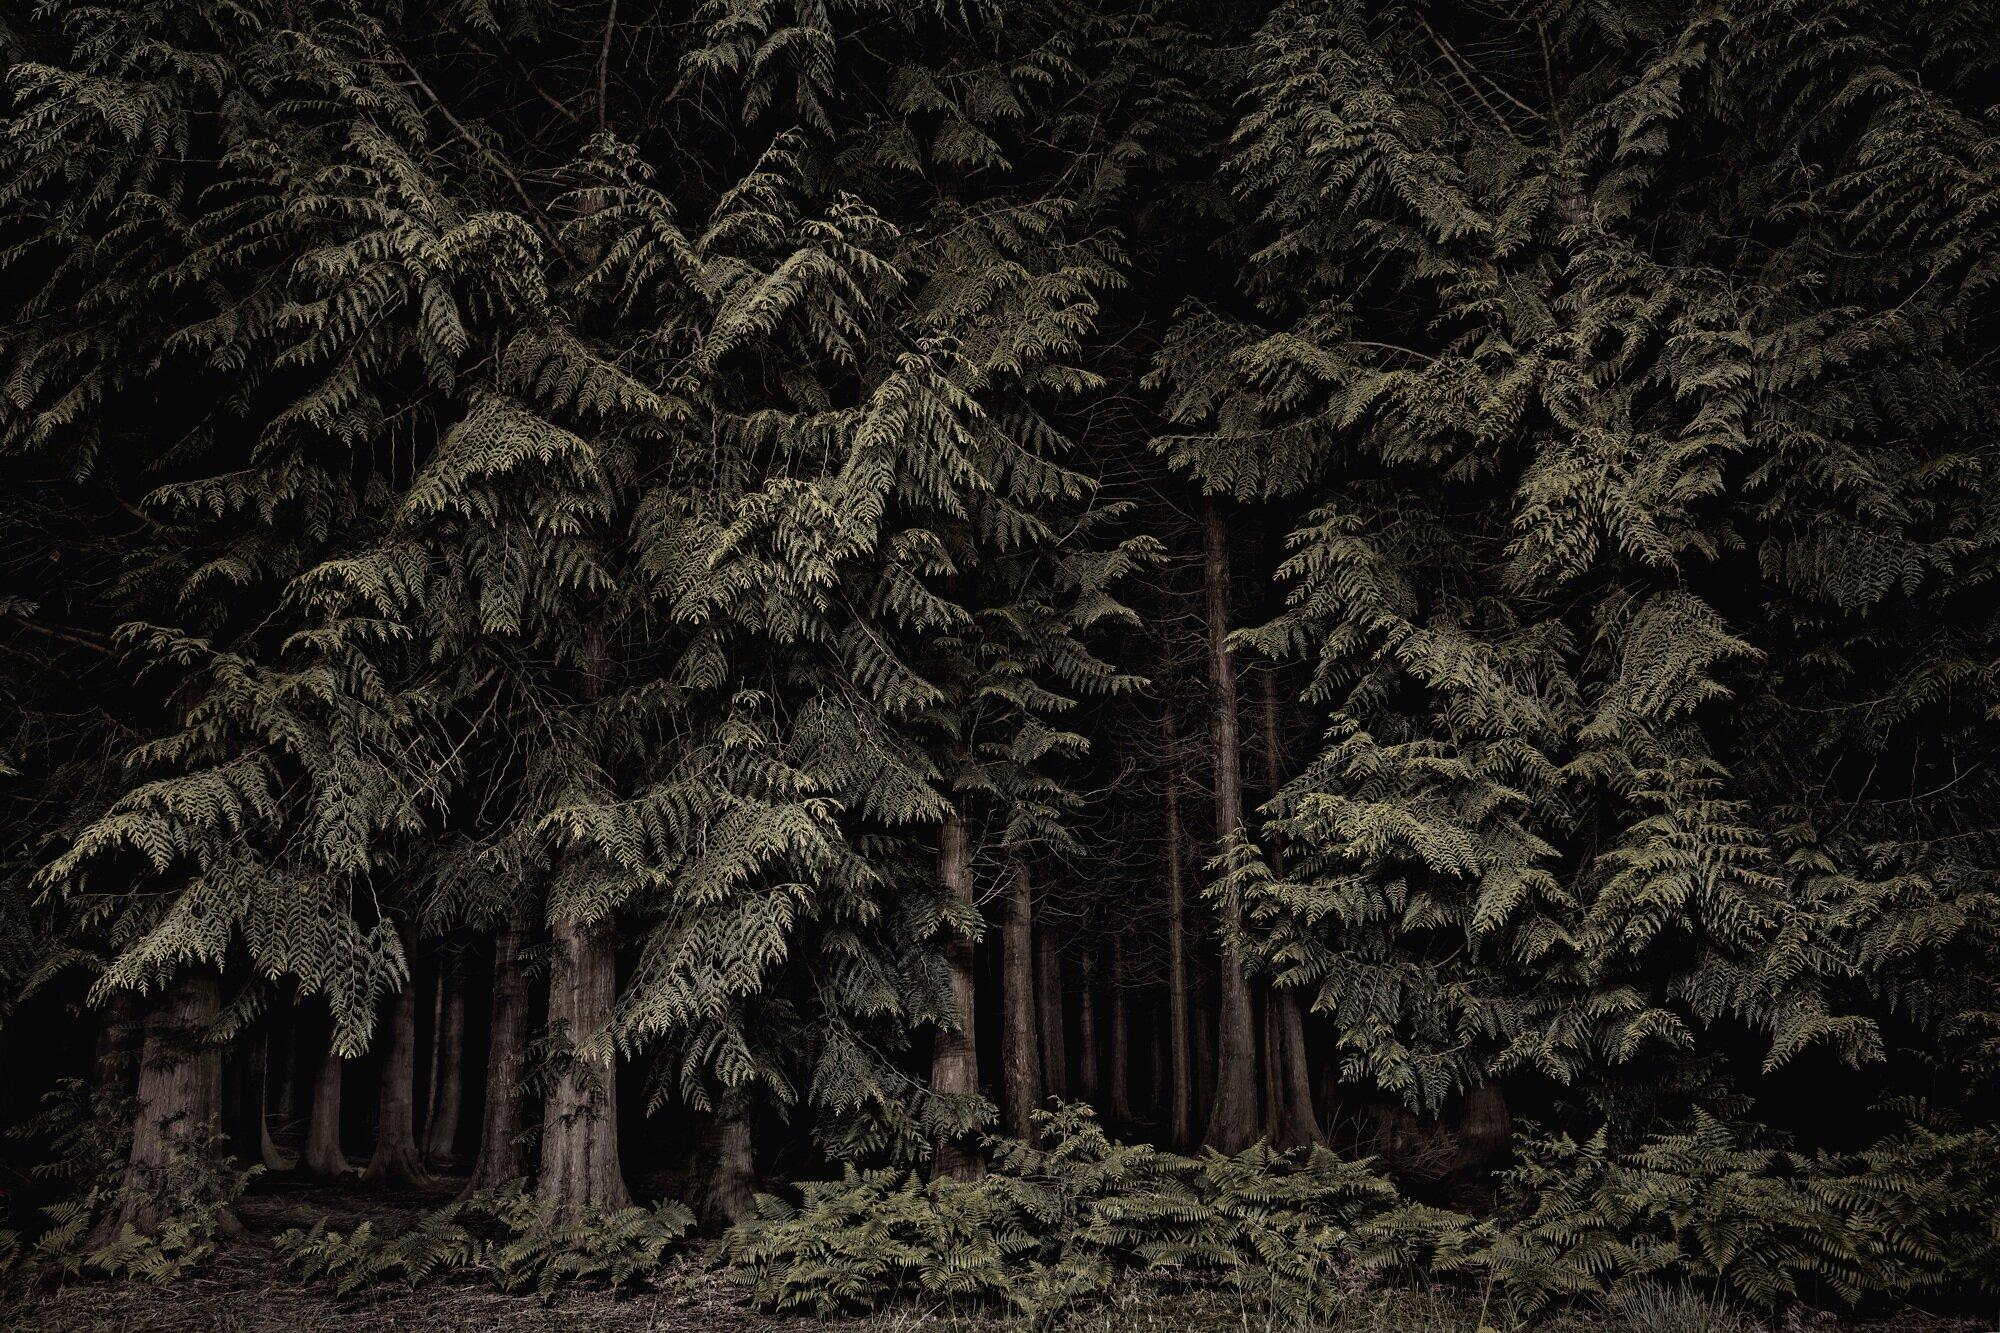 oldhouse-cedars1.jpg